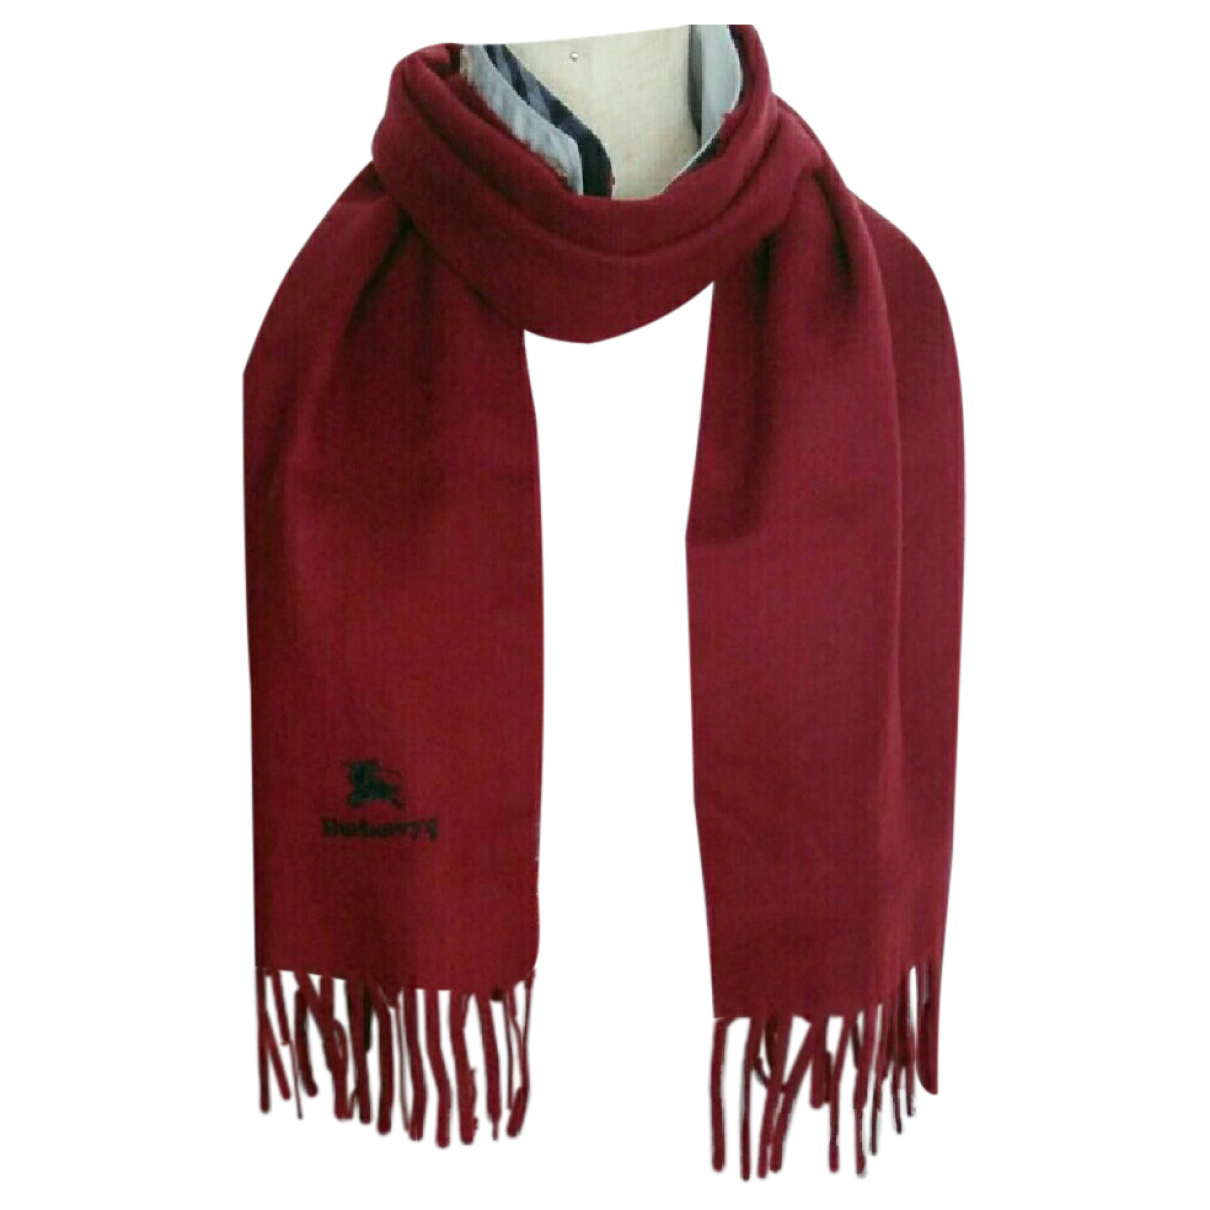 Burberry \N Burgundy Wool scarf for Women \N